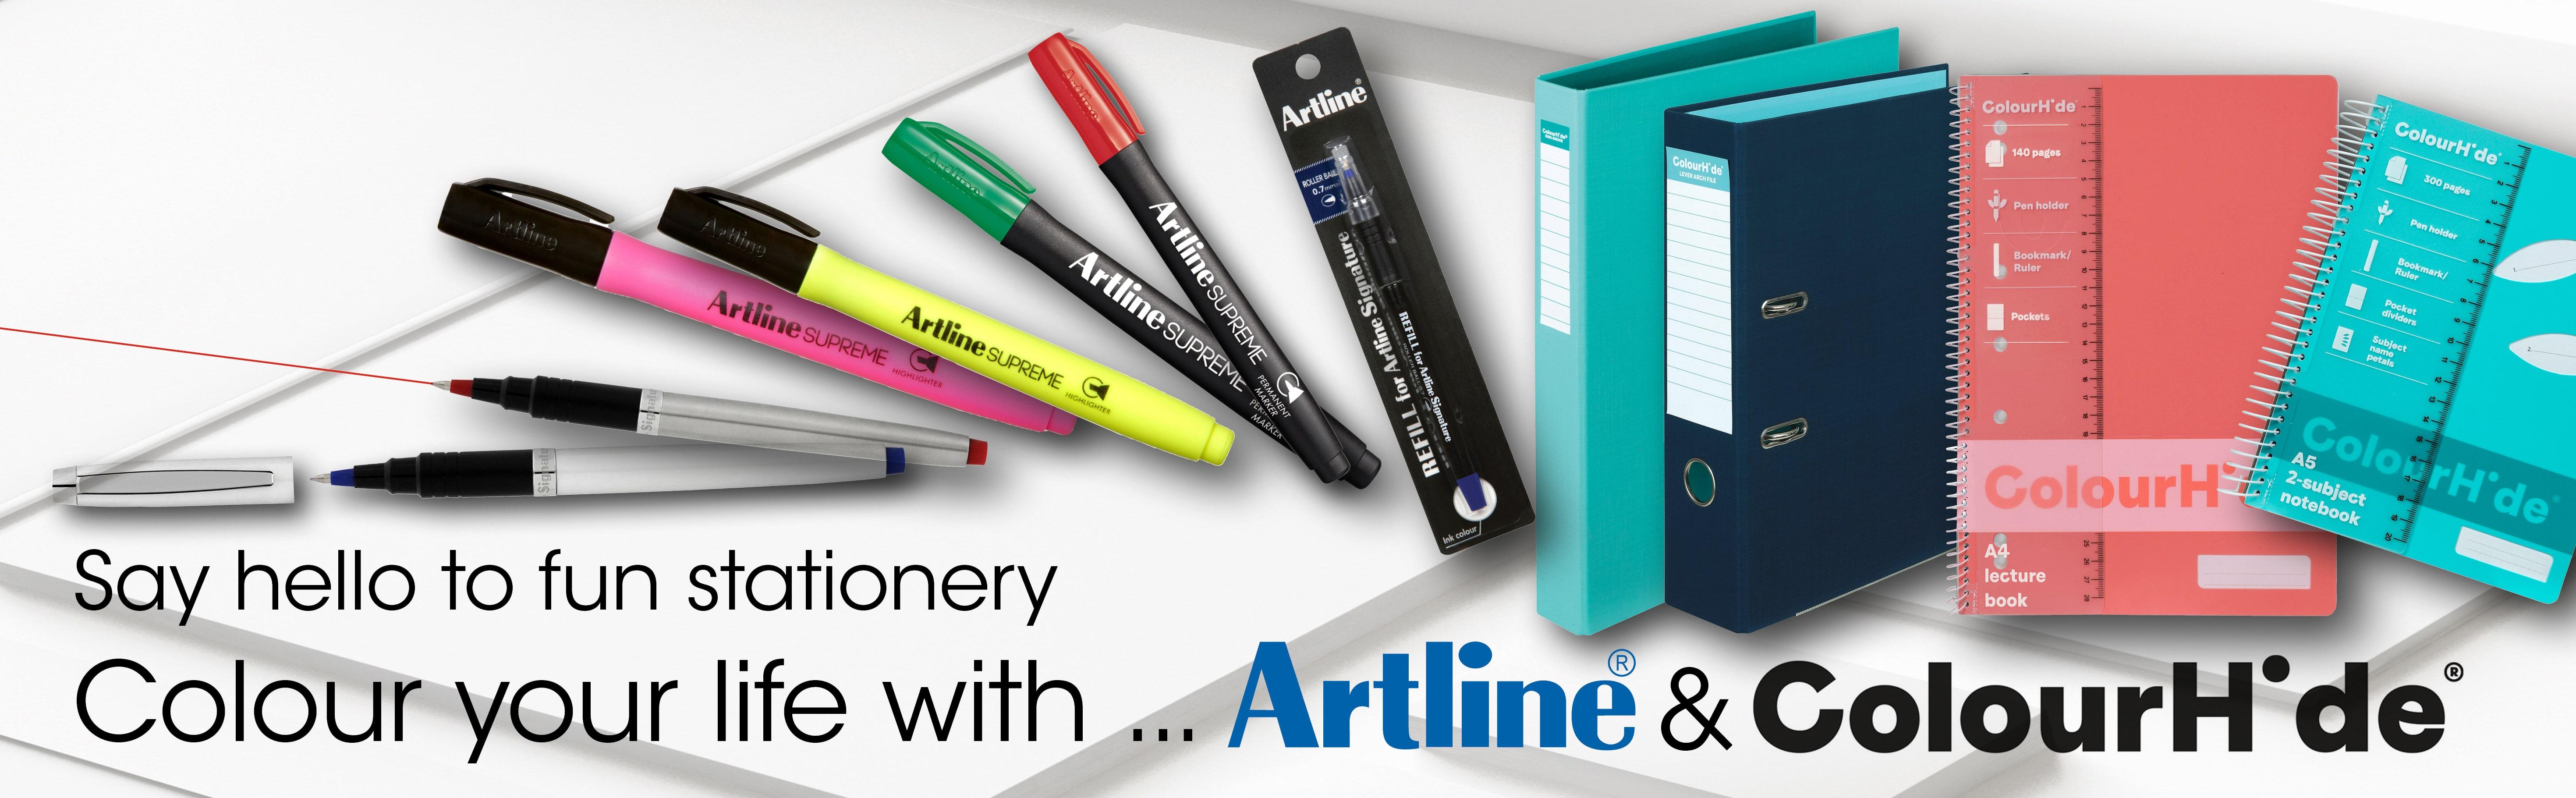 Artline and Colourhide